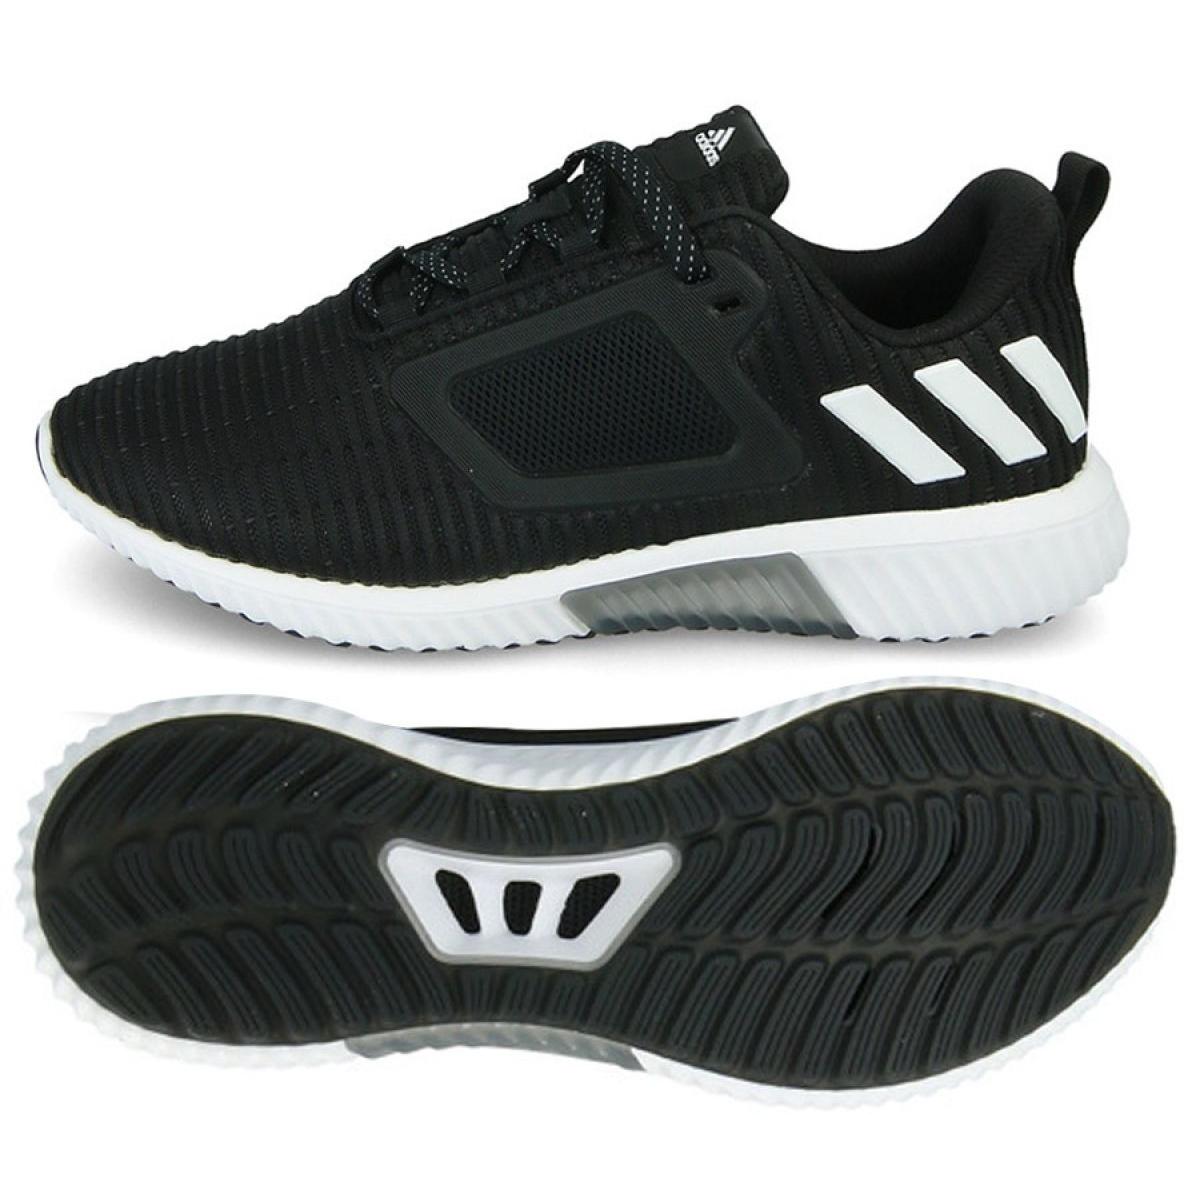 Adidas Climacool Running shoes adidas Climacool M CM7405 - ButyModne.pl